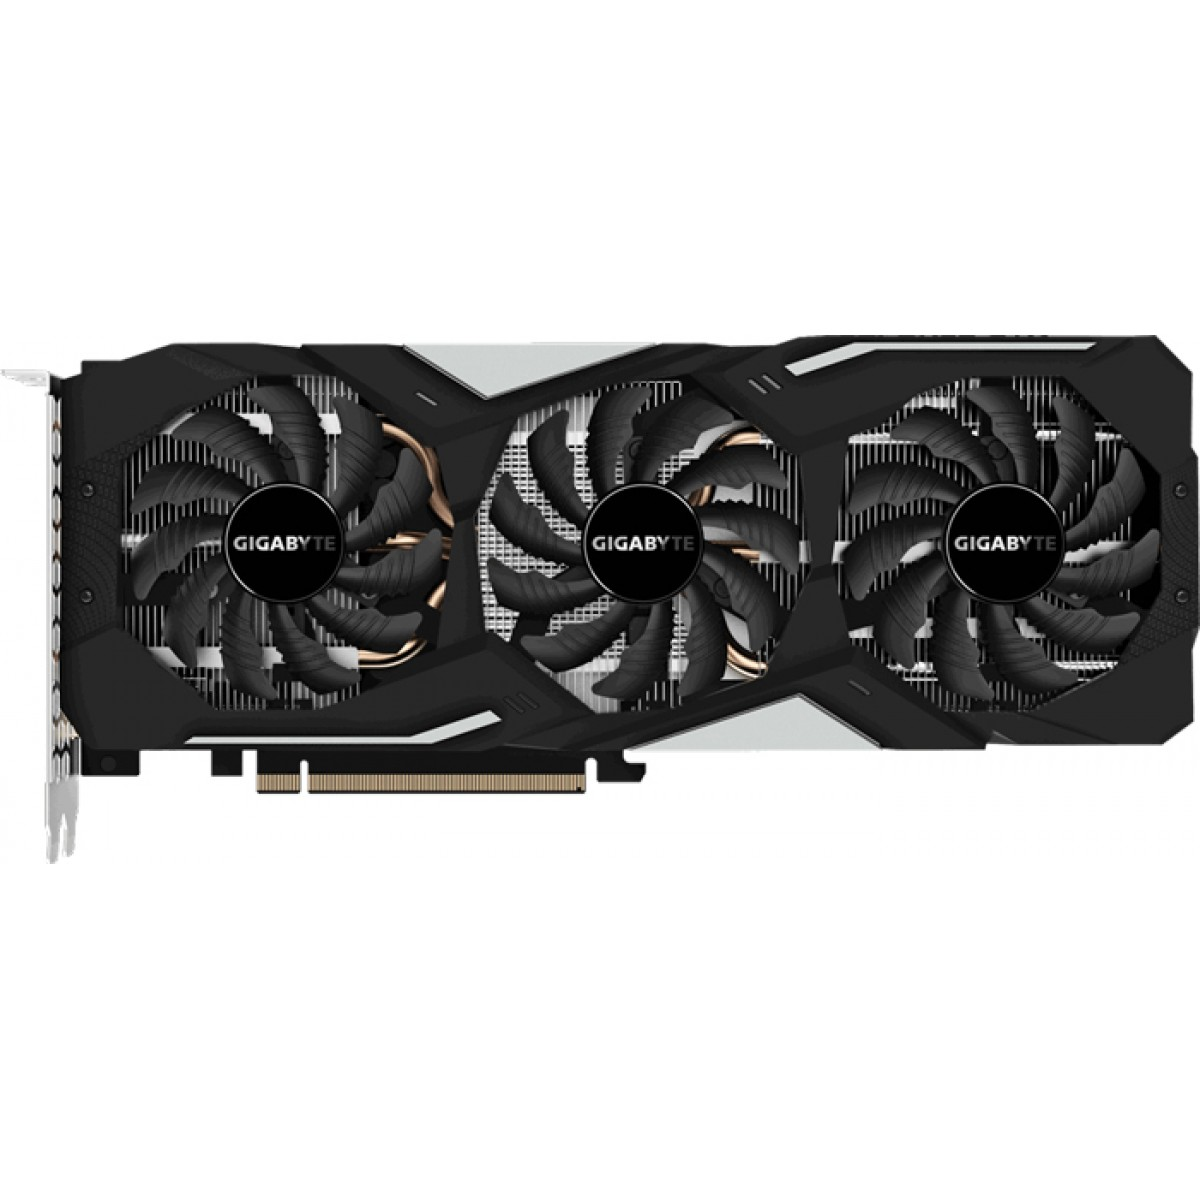 Placa de Vídeo Gigabyte GeForce GTX 1660 Gaming OC, 6GB GDDR5, 192Bit, GV-N1660GAMING OC-6GD